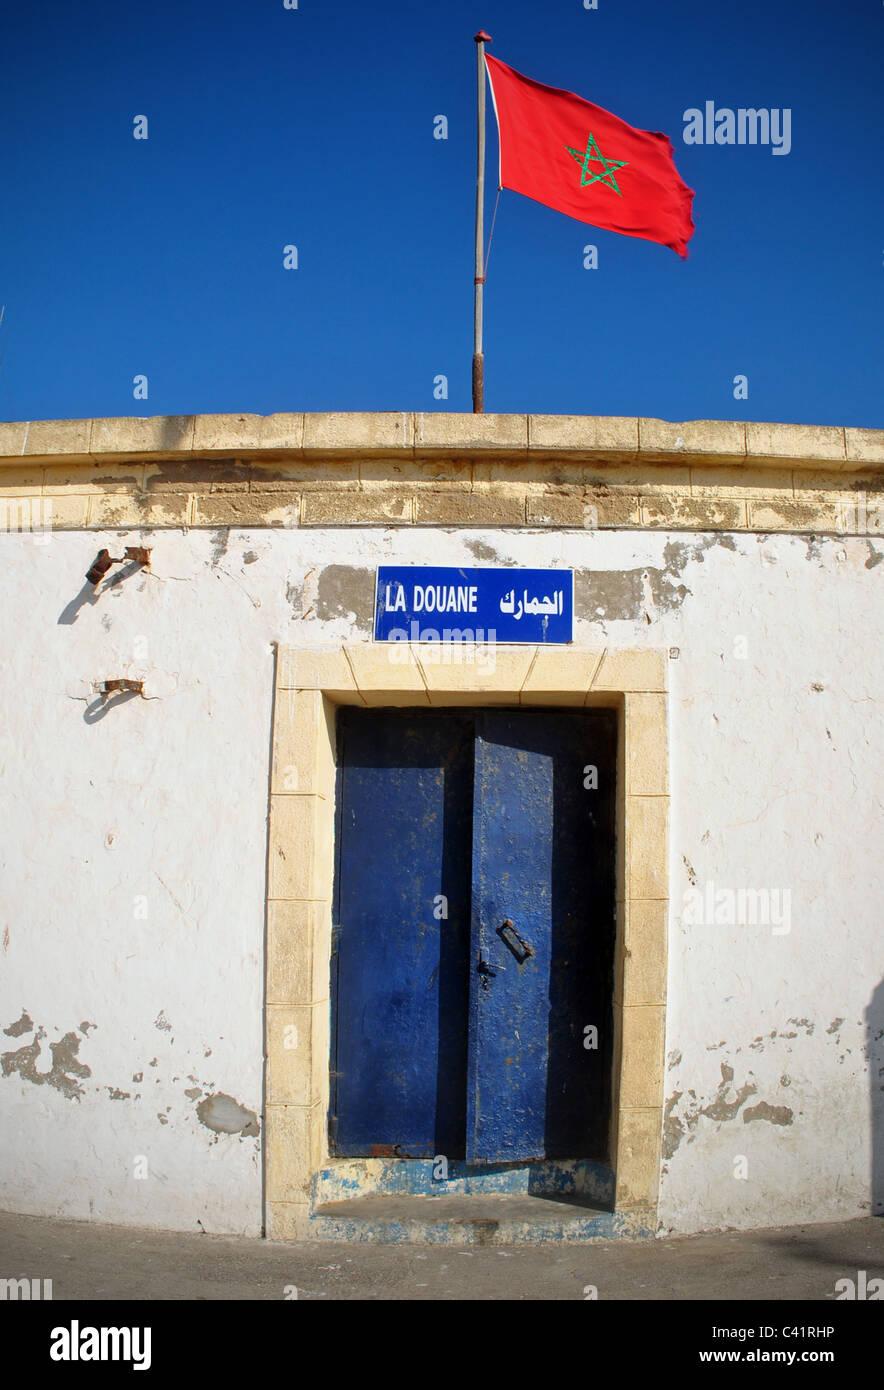 Bureau de douane dans Essaouira, Maroc Photo Stock